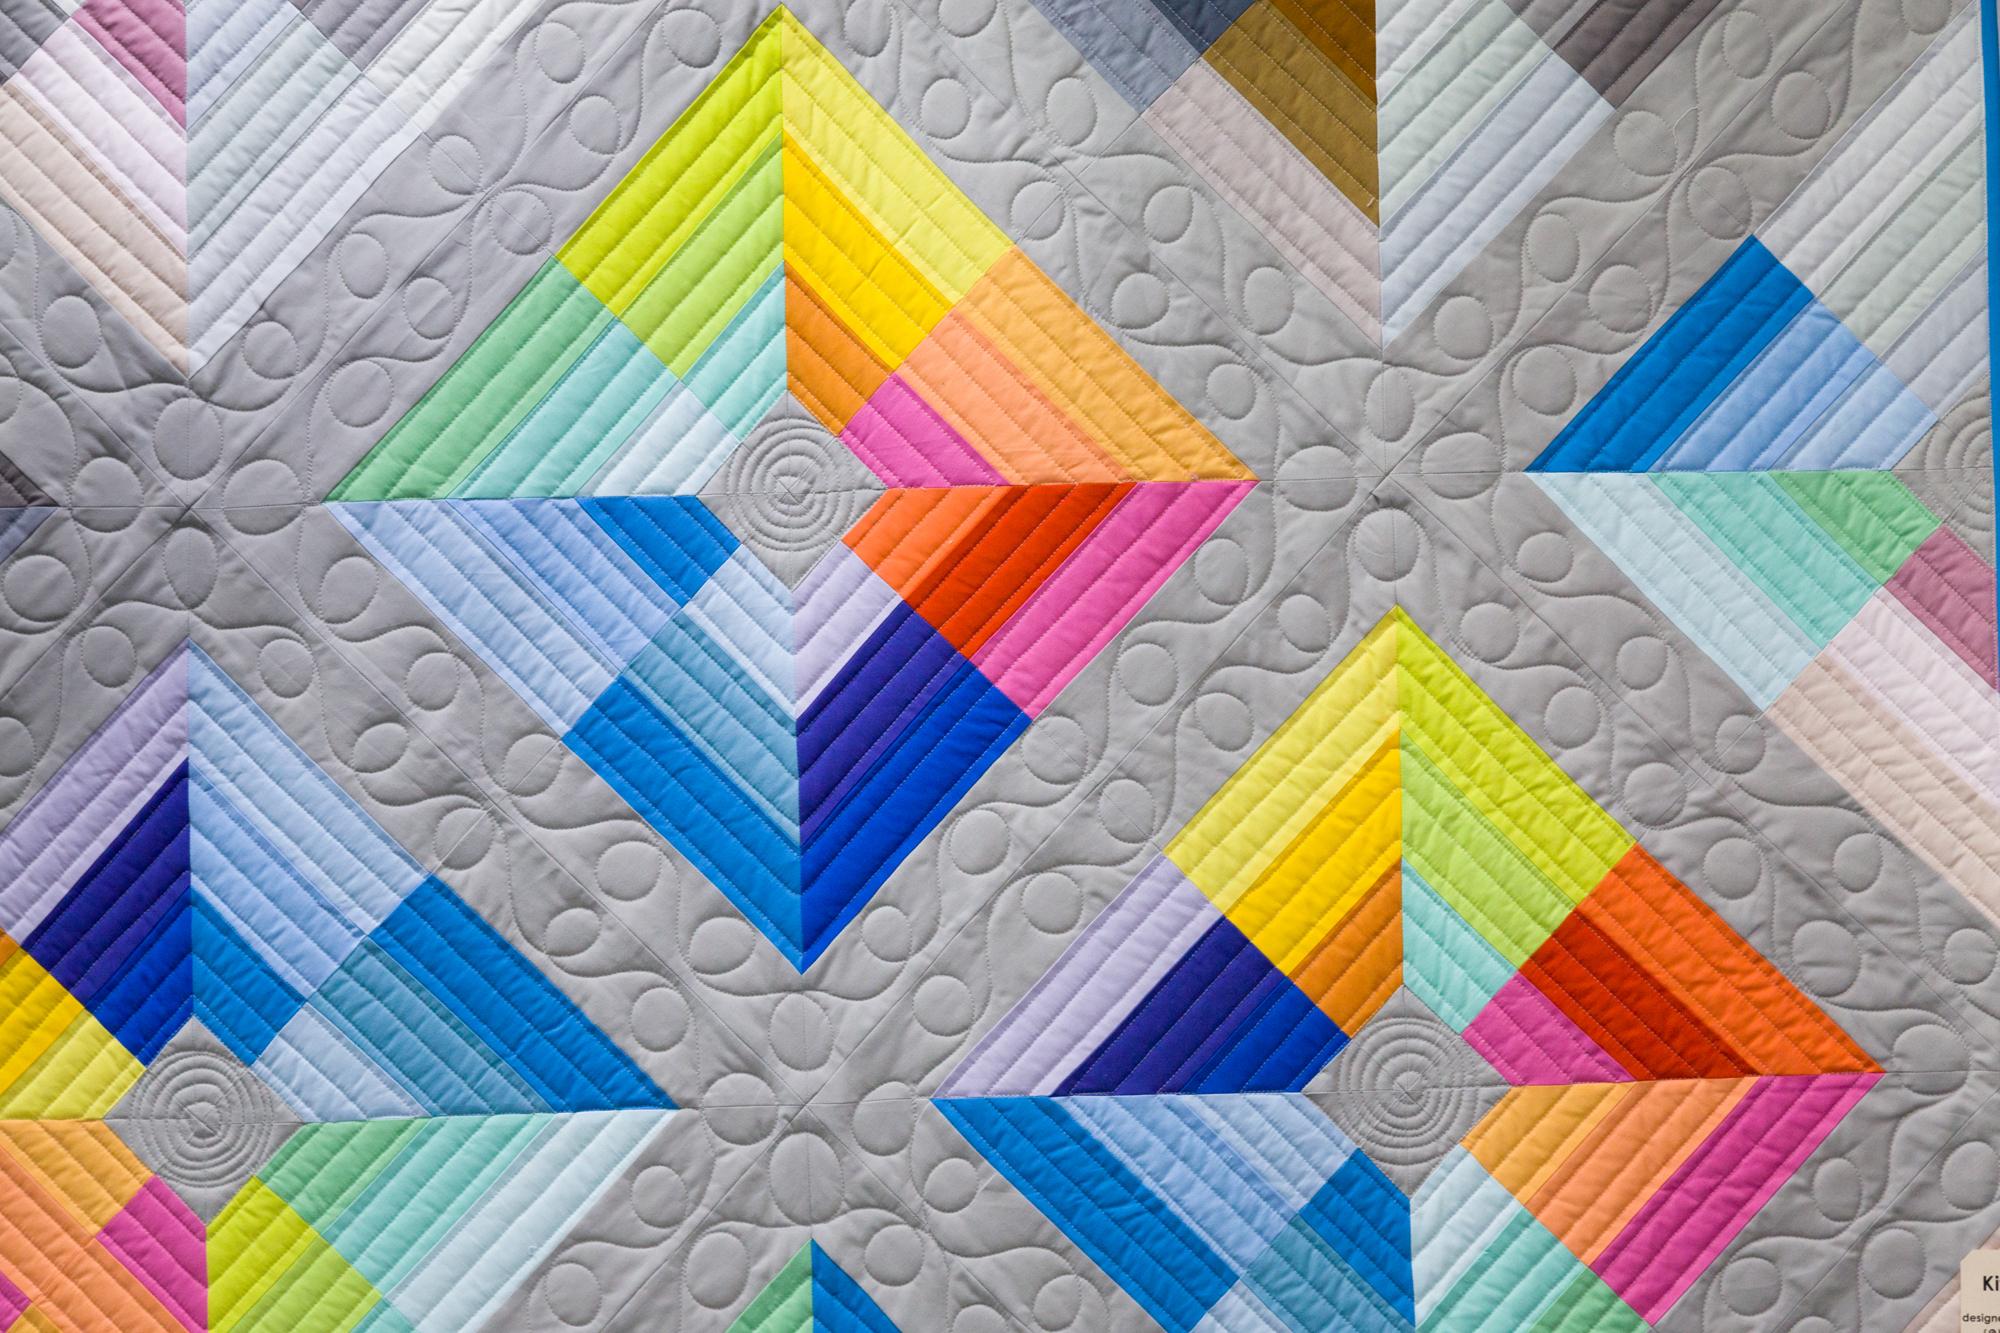 RK_QMfall17_Kona colors wall_10.jpg